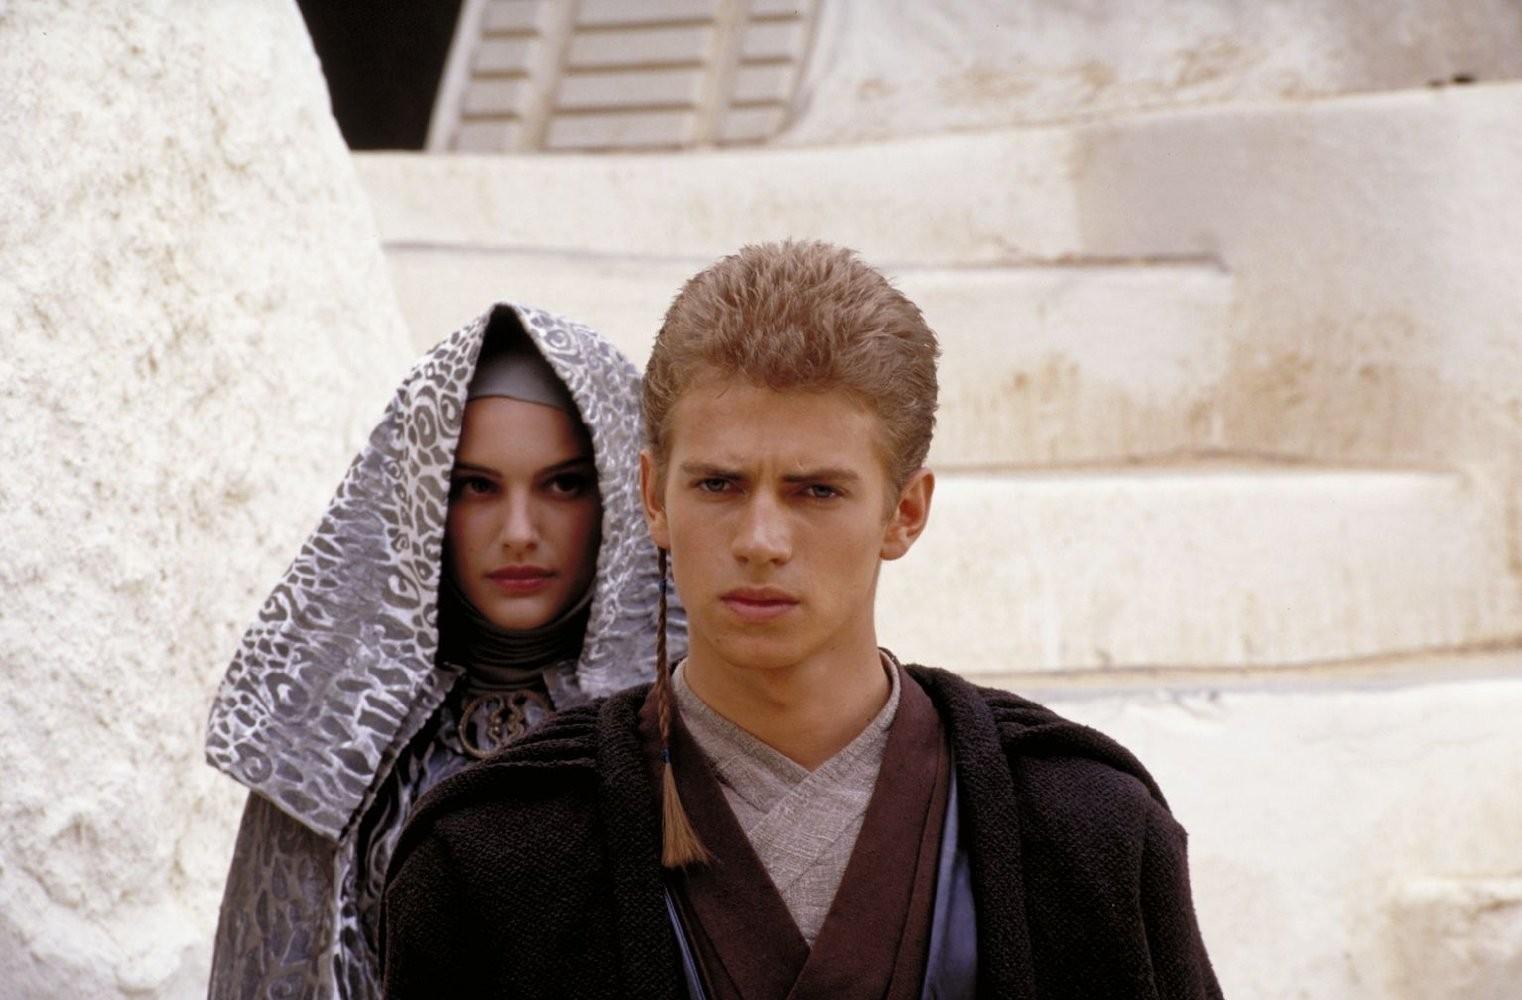 Natalie Portman e Hayden Christensen na saga 'Star Wars' (Foto: Divulgação)